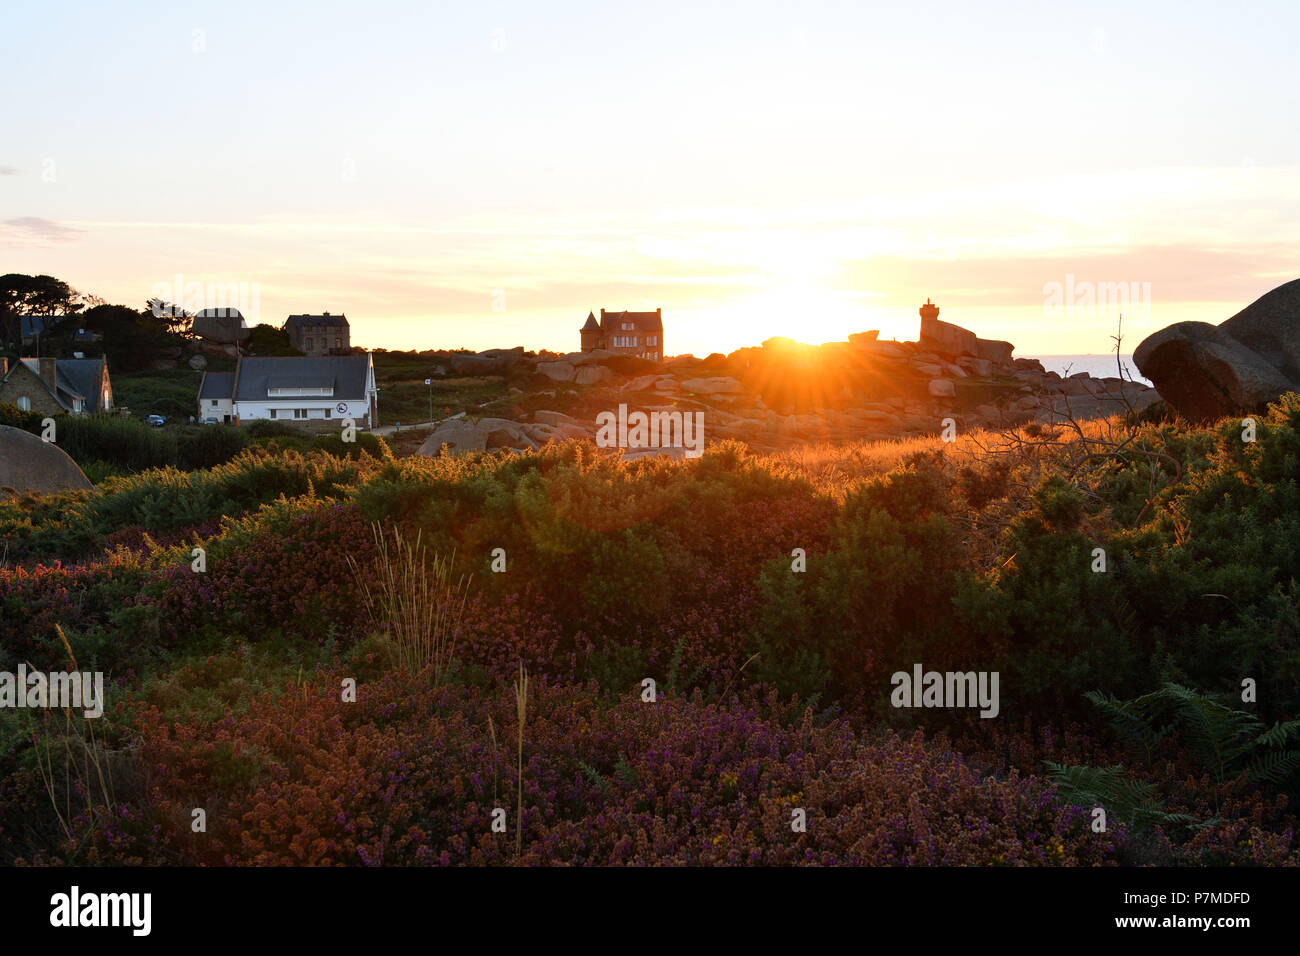 France, Cotes d'Armor, Perros Guirec, Ploumanac'h, Pink Granite coast (cote de Granit Rose), pointe de Squewel Stock Photo